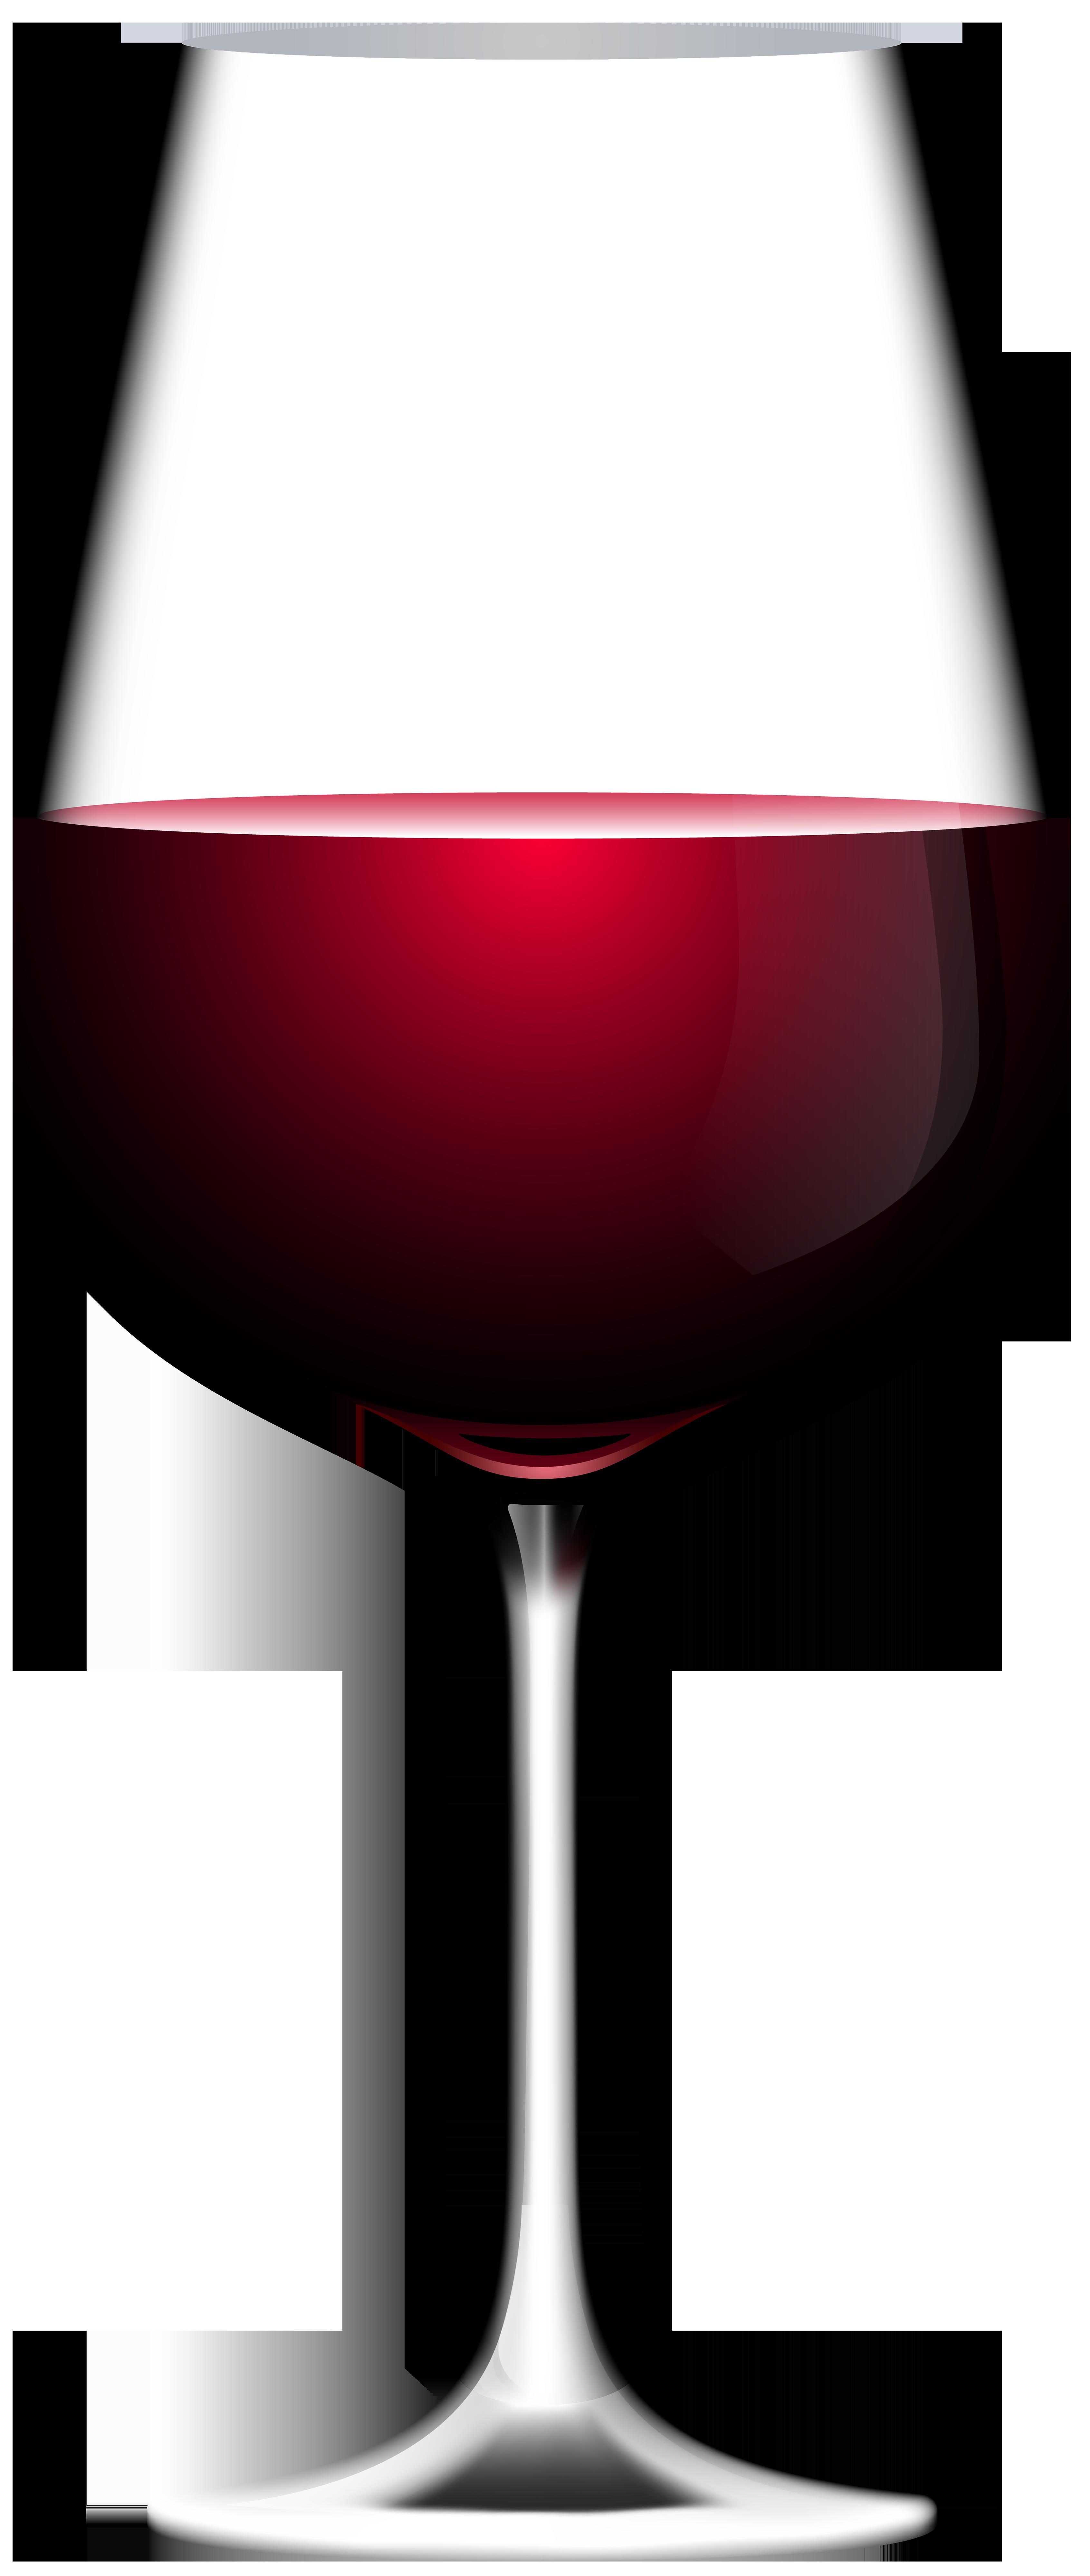 Red Wine White wine Orlando Wines Wine glass.